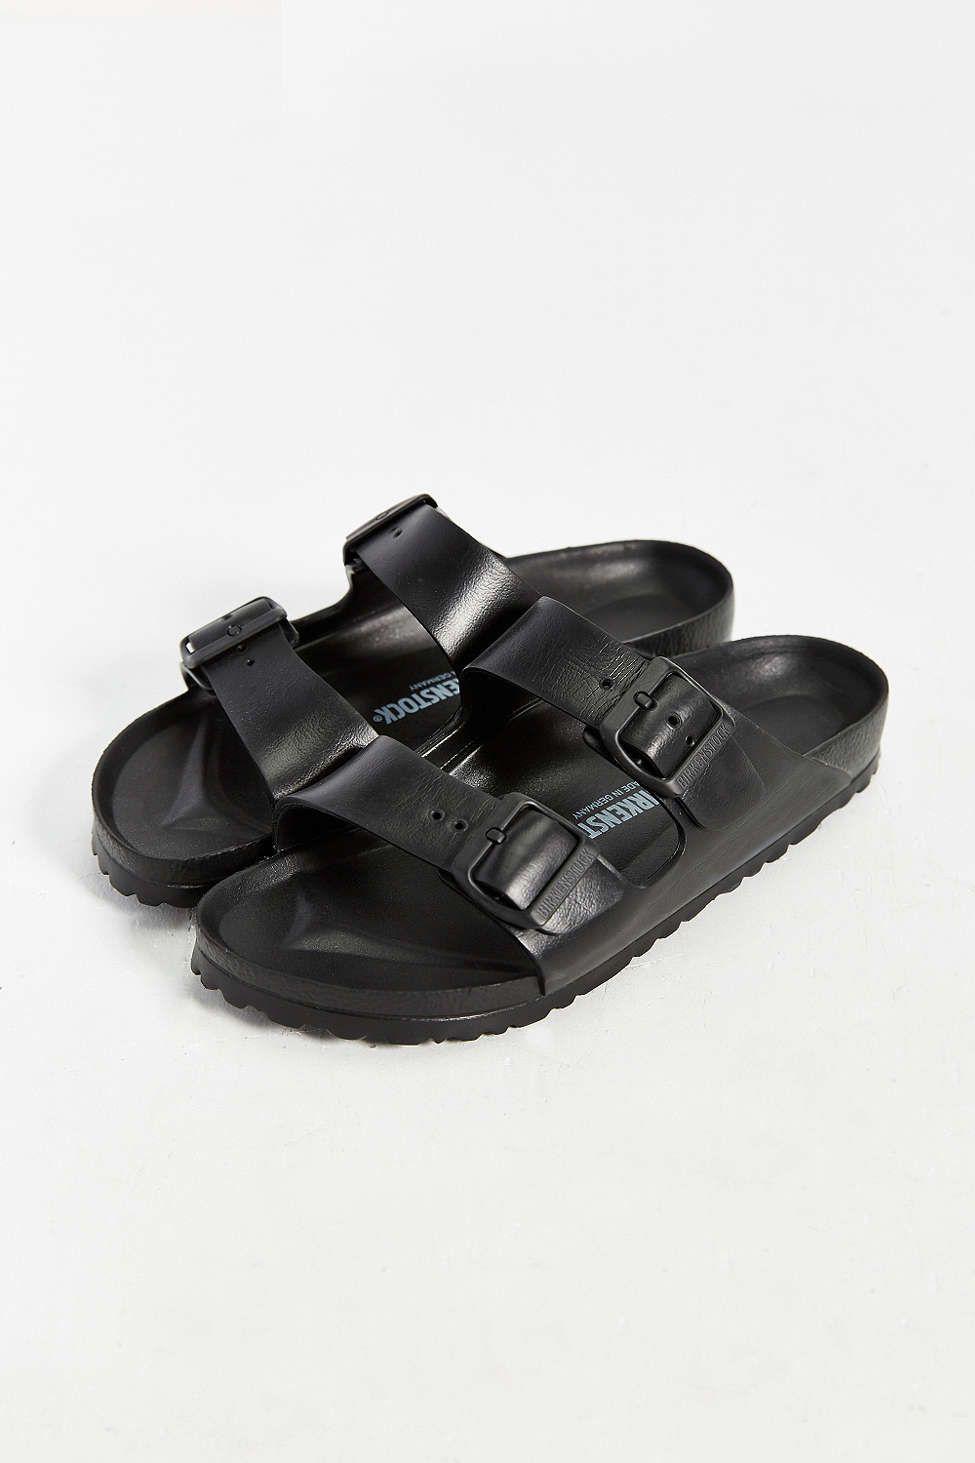 65e8a6585a08 Birkenstock Arizona Rubber EVA Sandal - Urban Outfitters